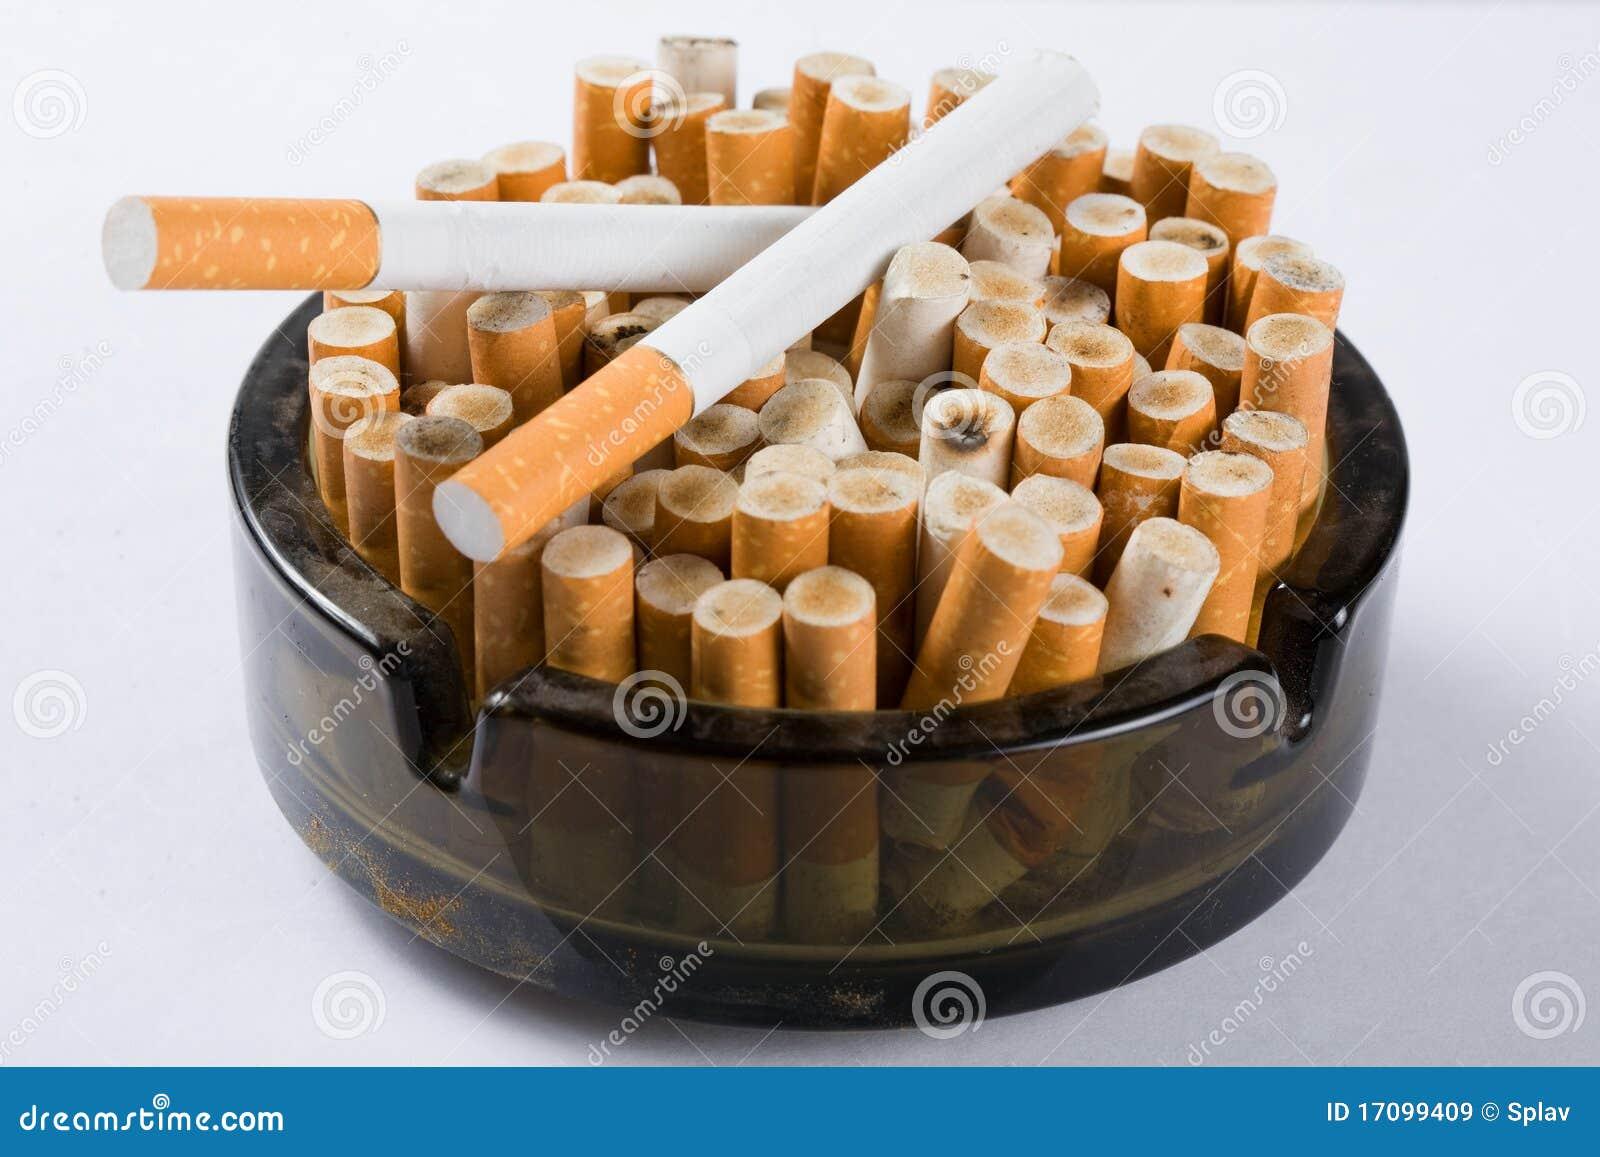 Zigaretten im Aschenbecher